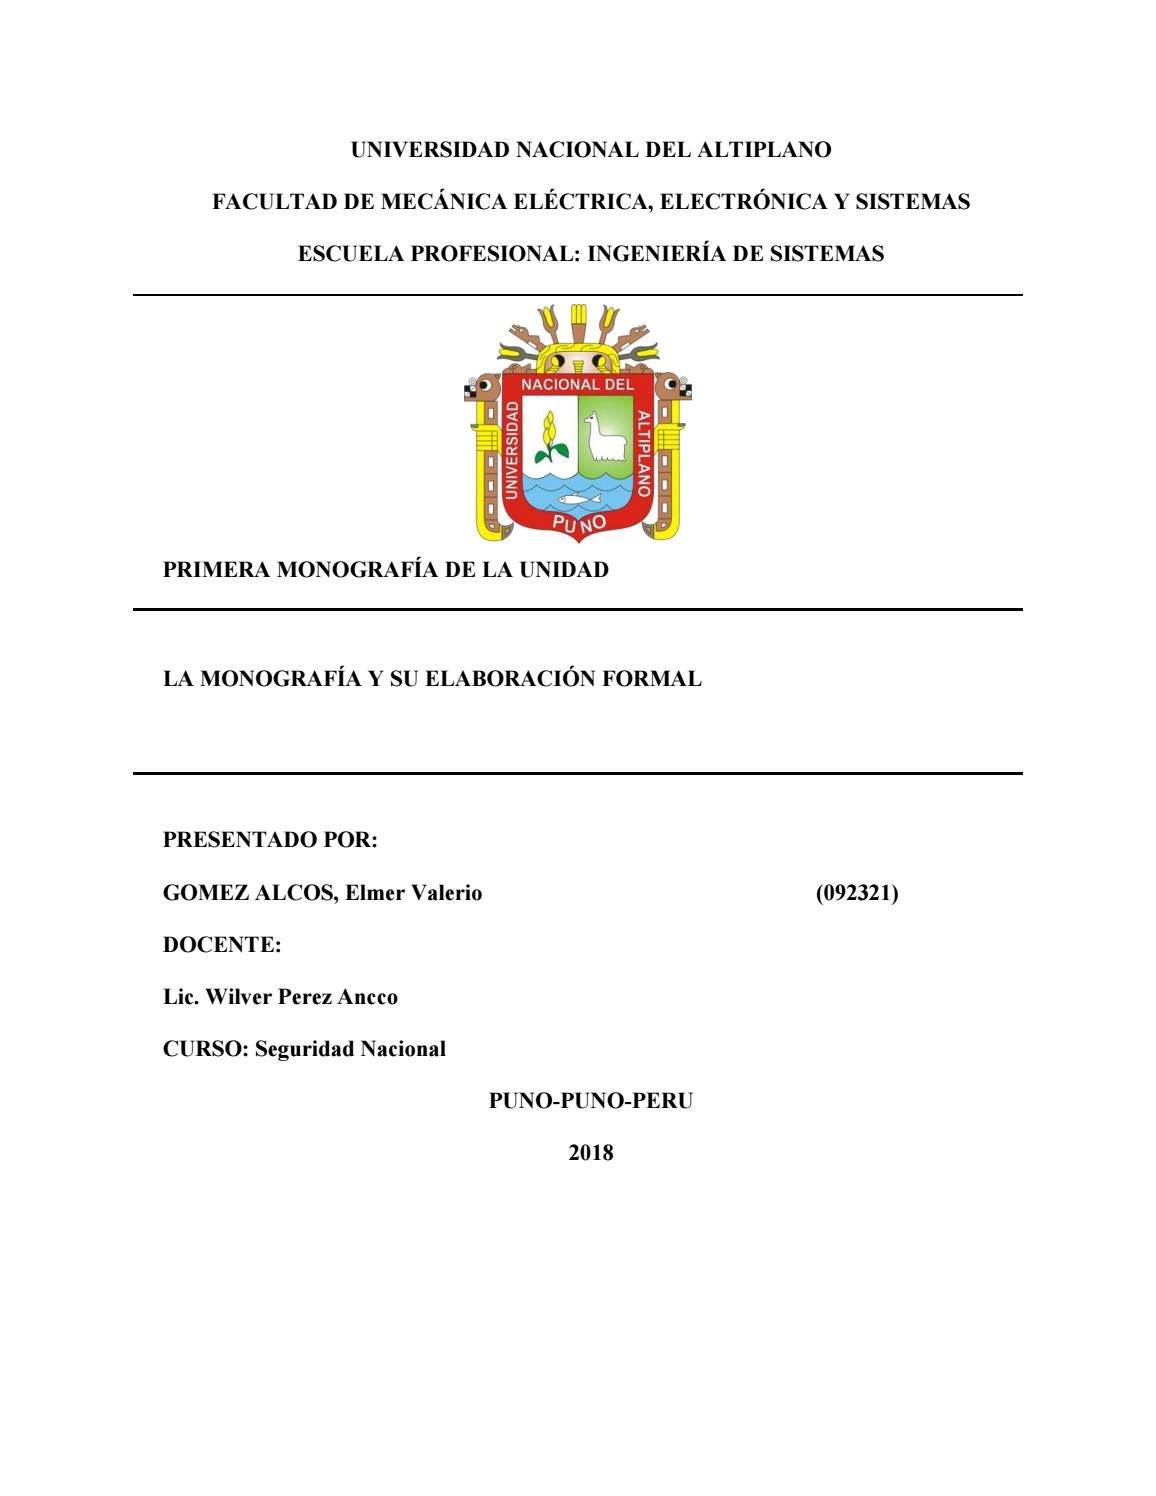 monografia con formato apa by elmer valerio gomez alcos